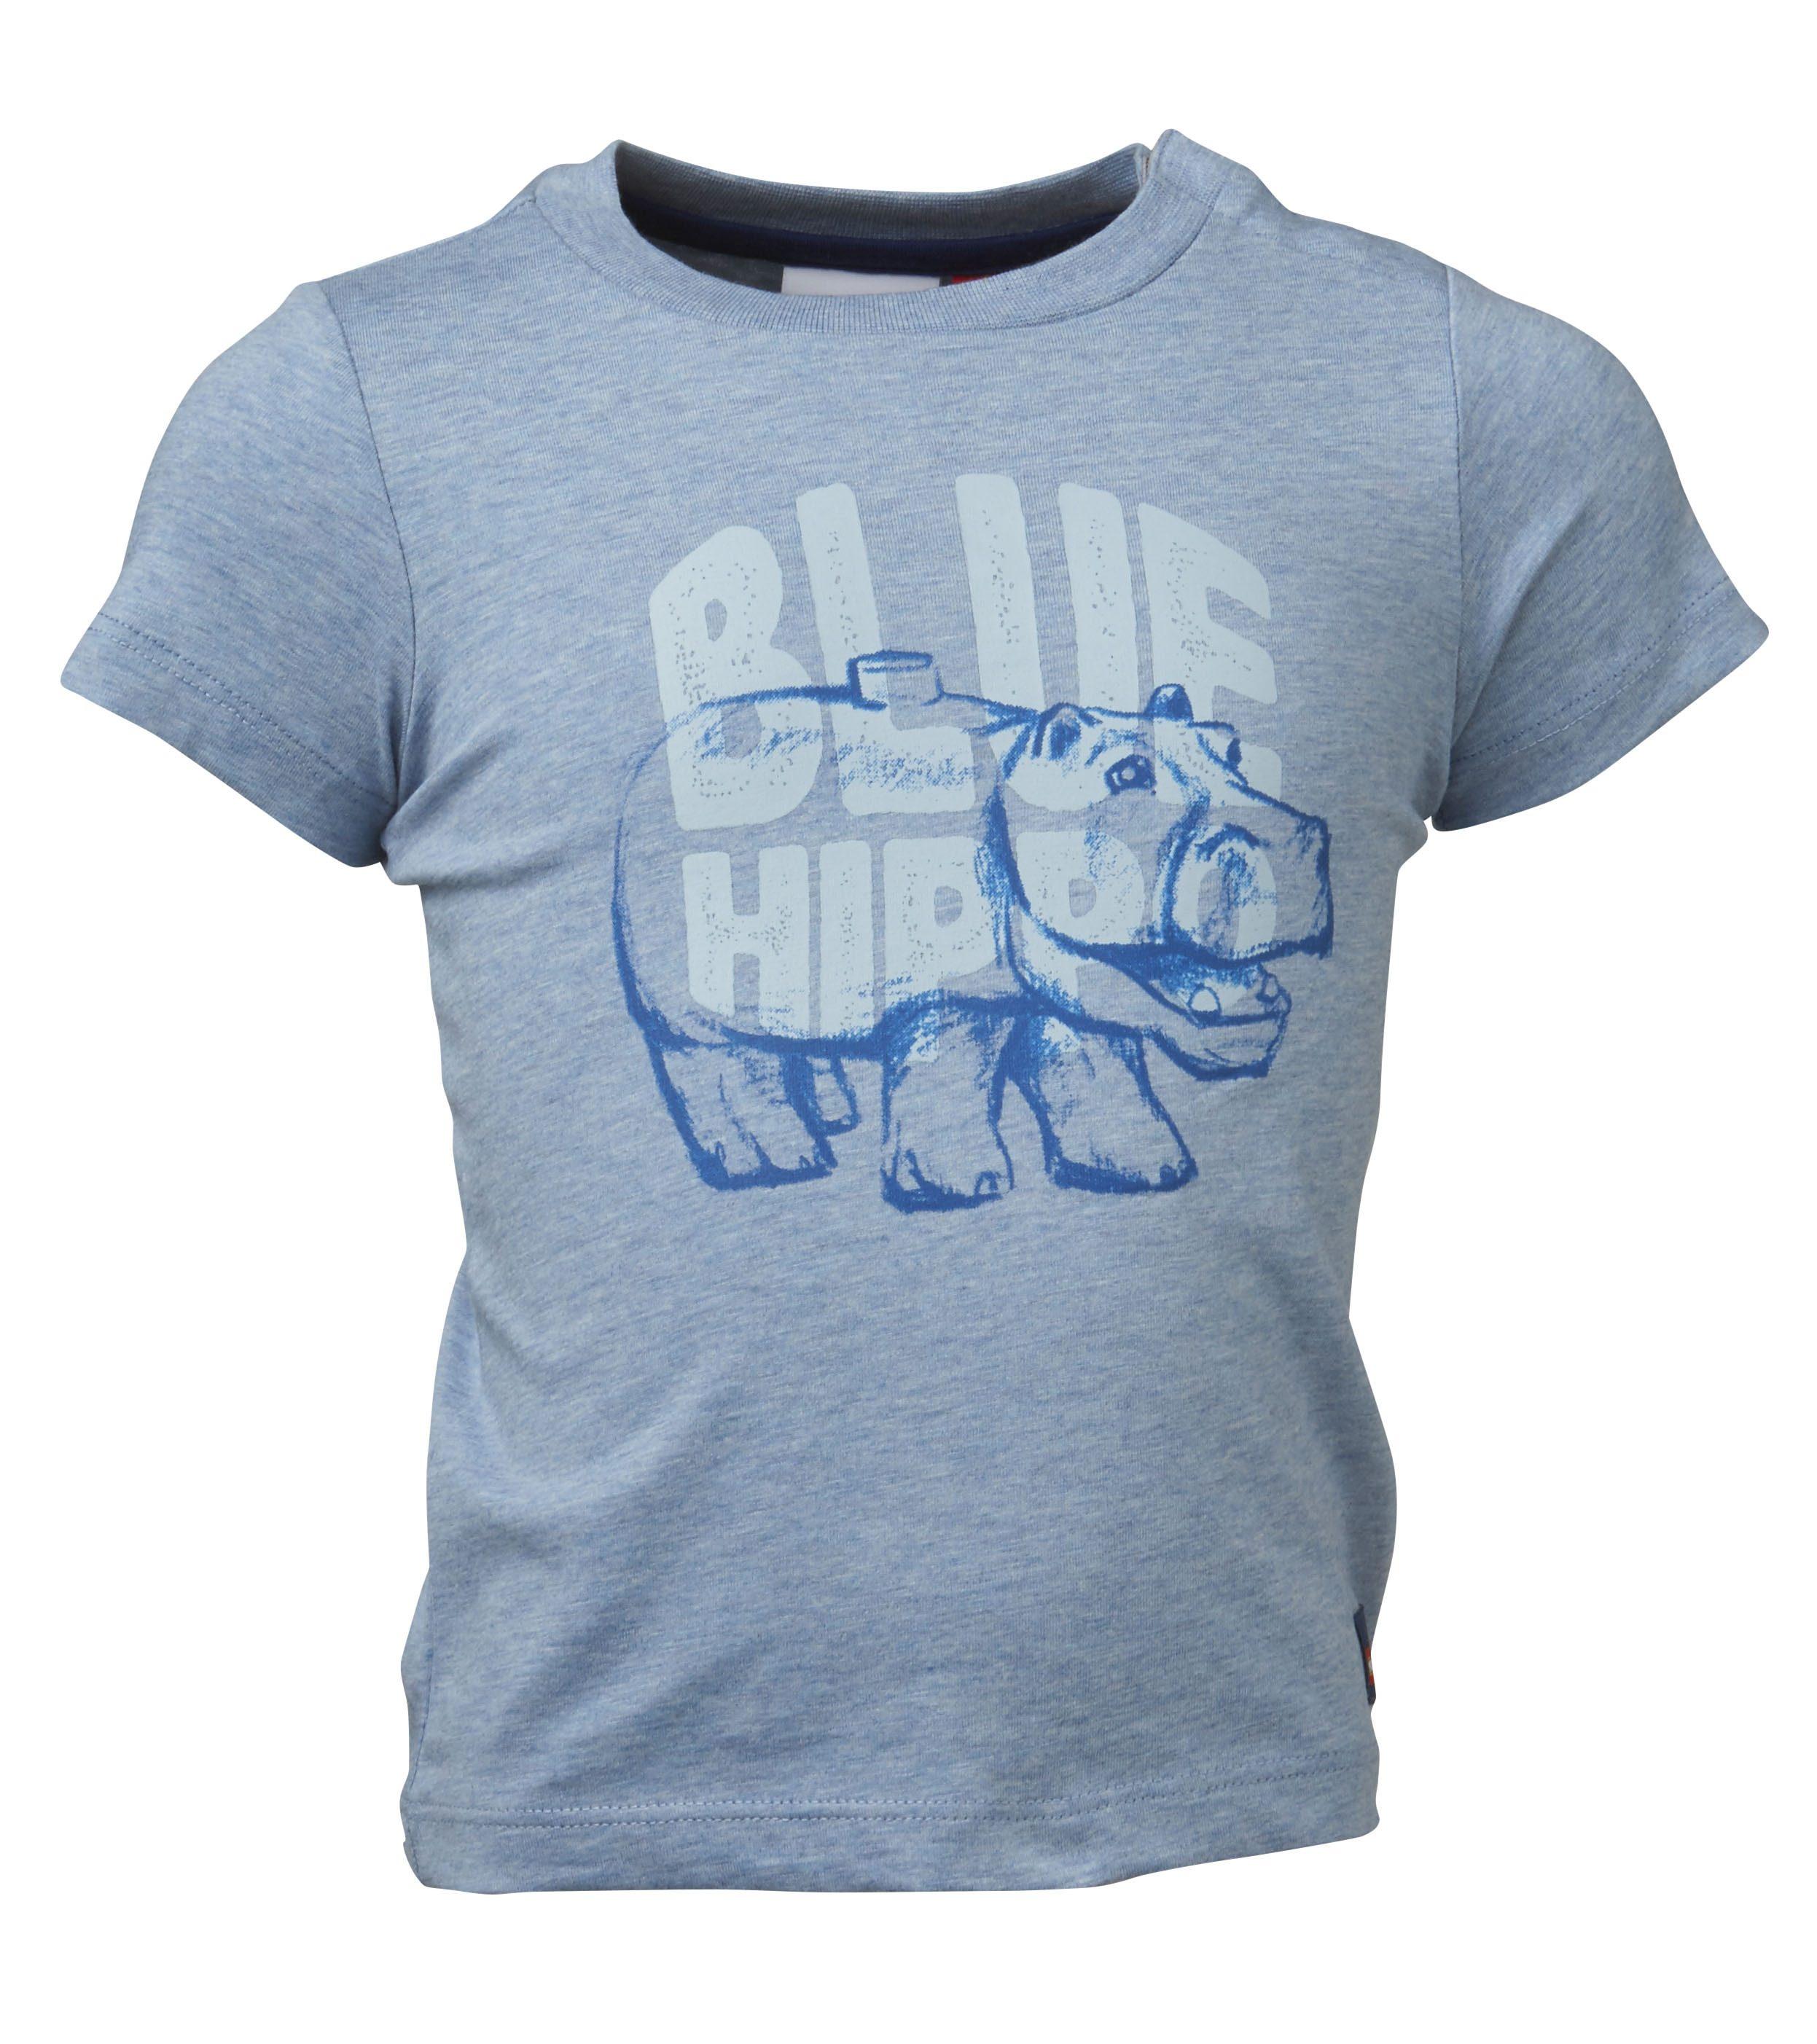 "LEGO Wear Duplo T-Shirt ""Green Hippo"" kurzarm Shirt Trey"